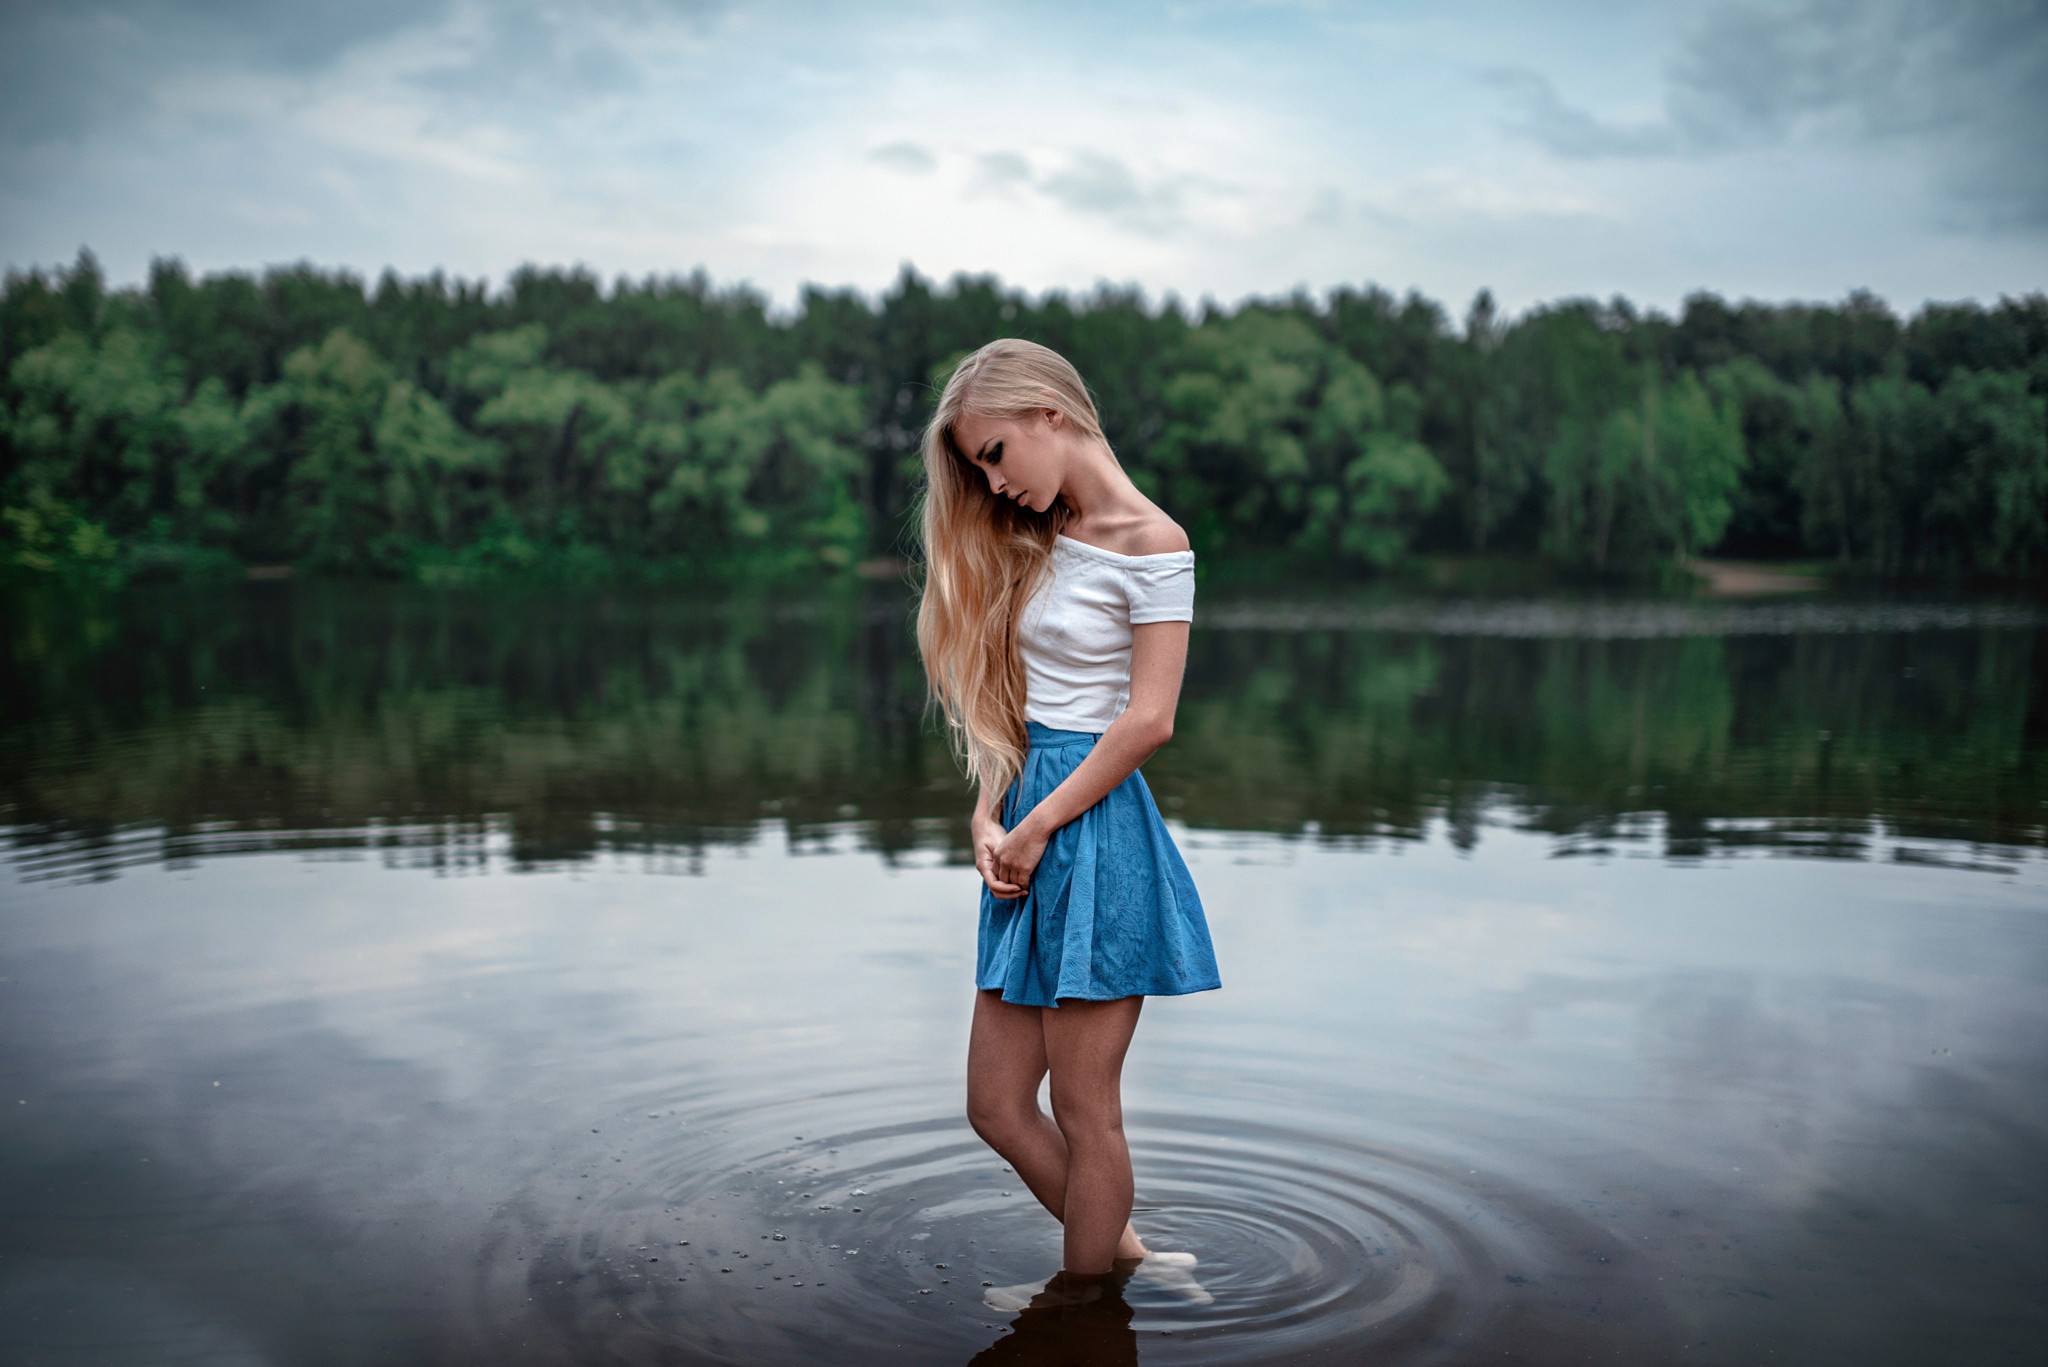 Cute, Sad, Girl, Alone, Lake